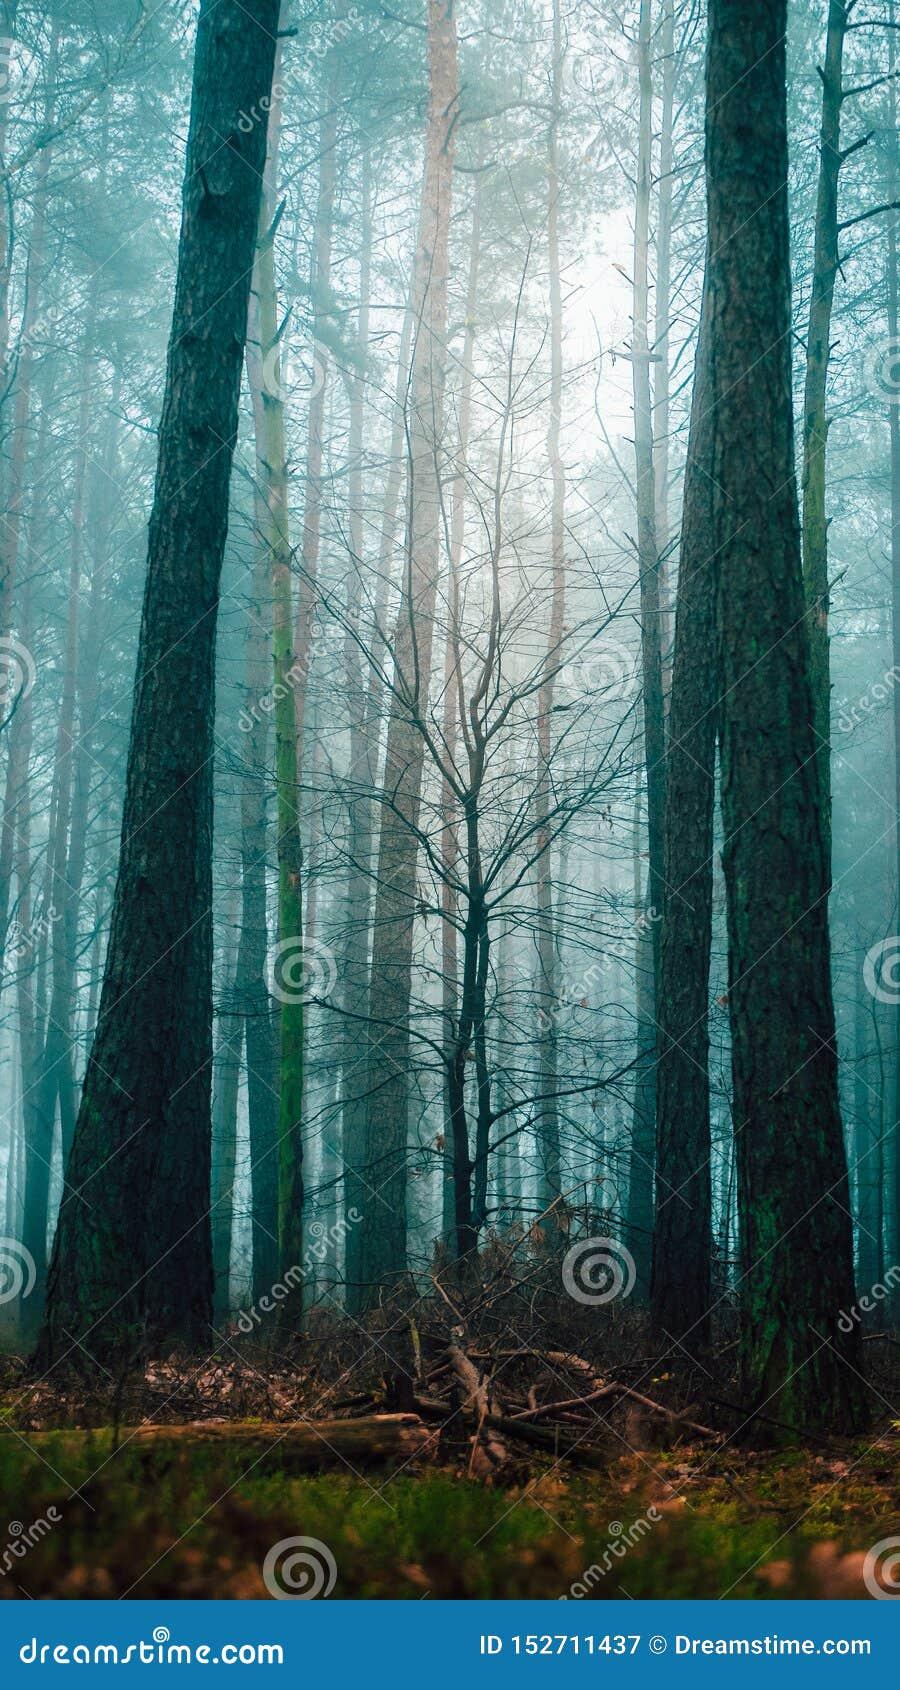 Misty tree in moody forest